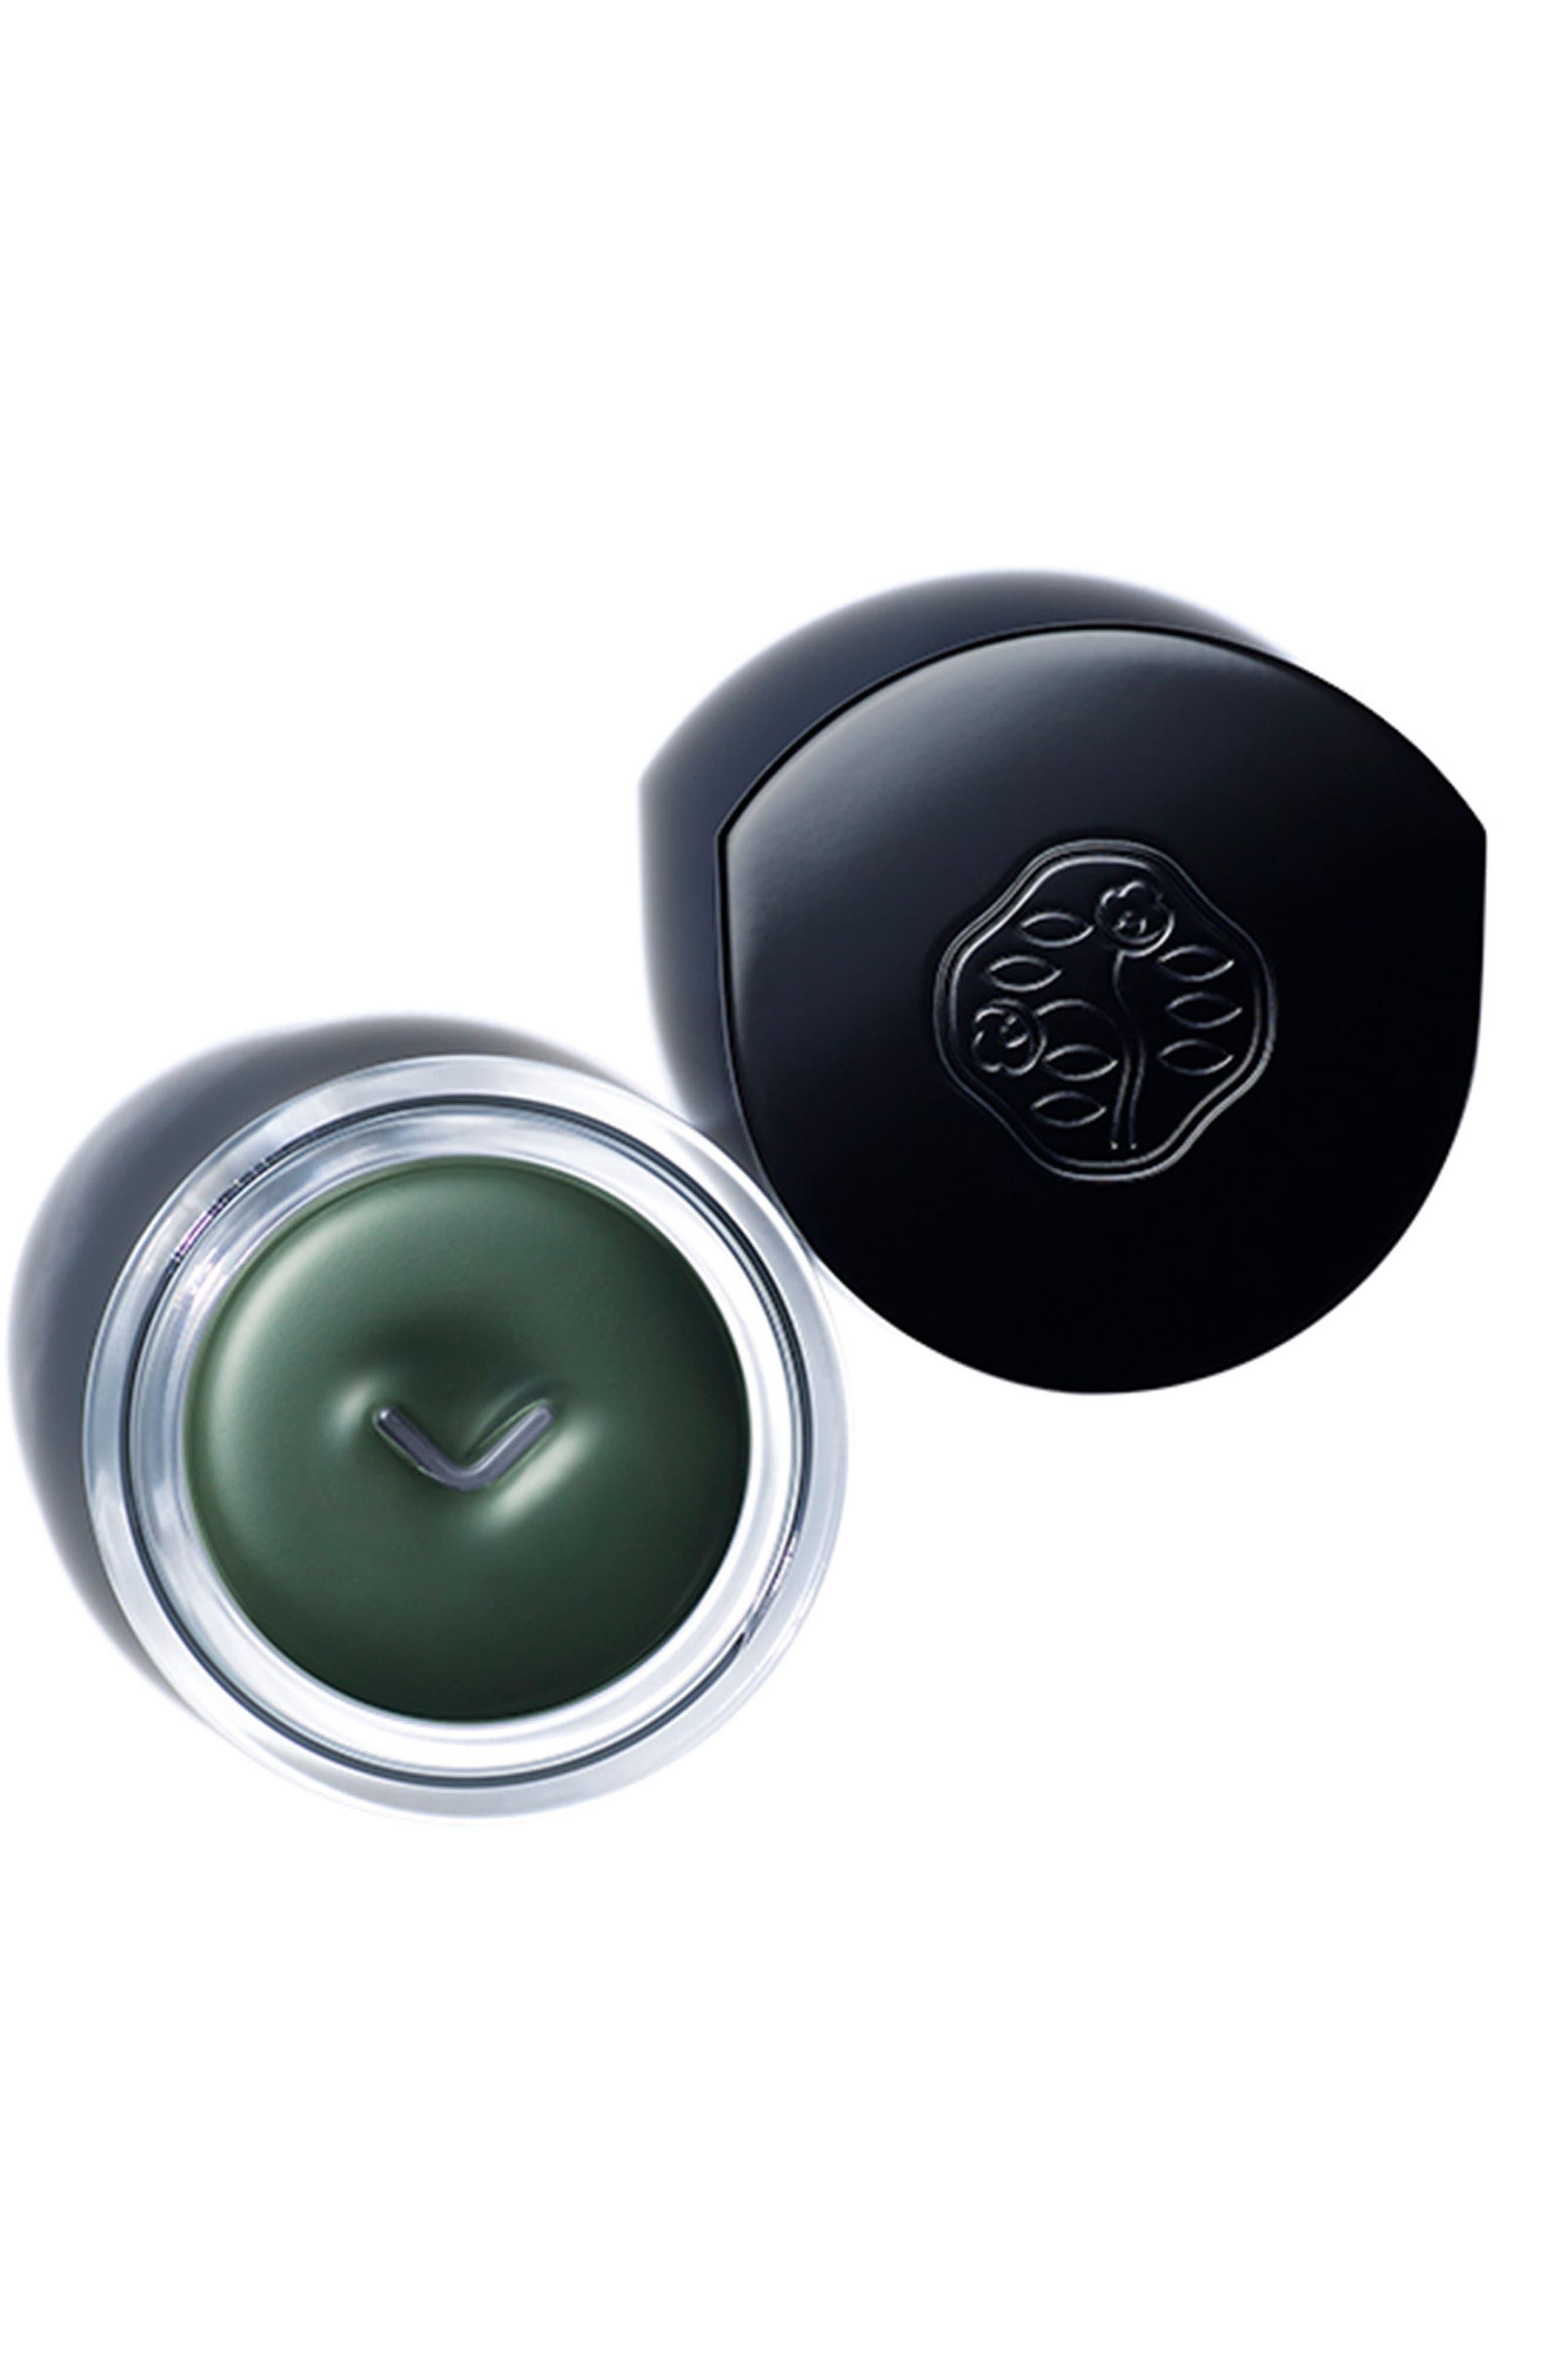 Shiseido Inkstroke Eyeliner